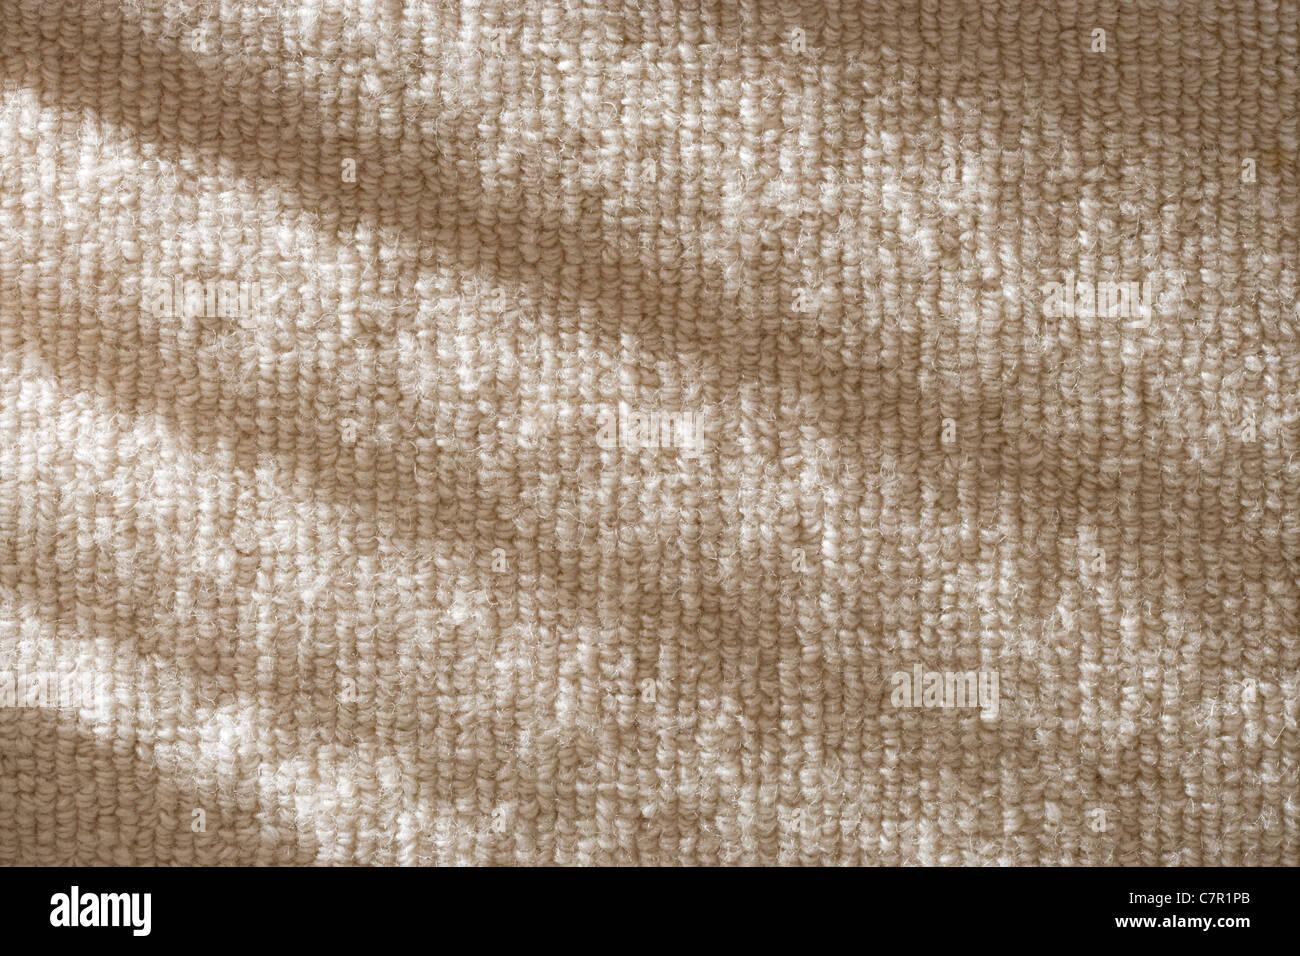 Carpet close up. - Stock Image